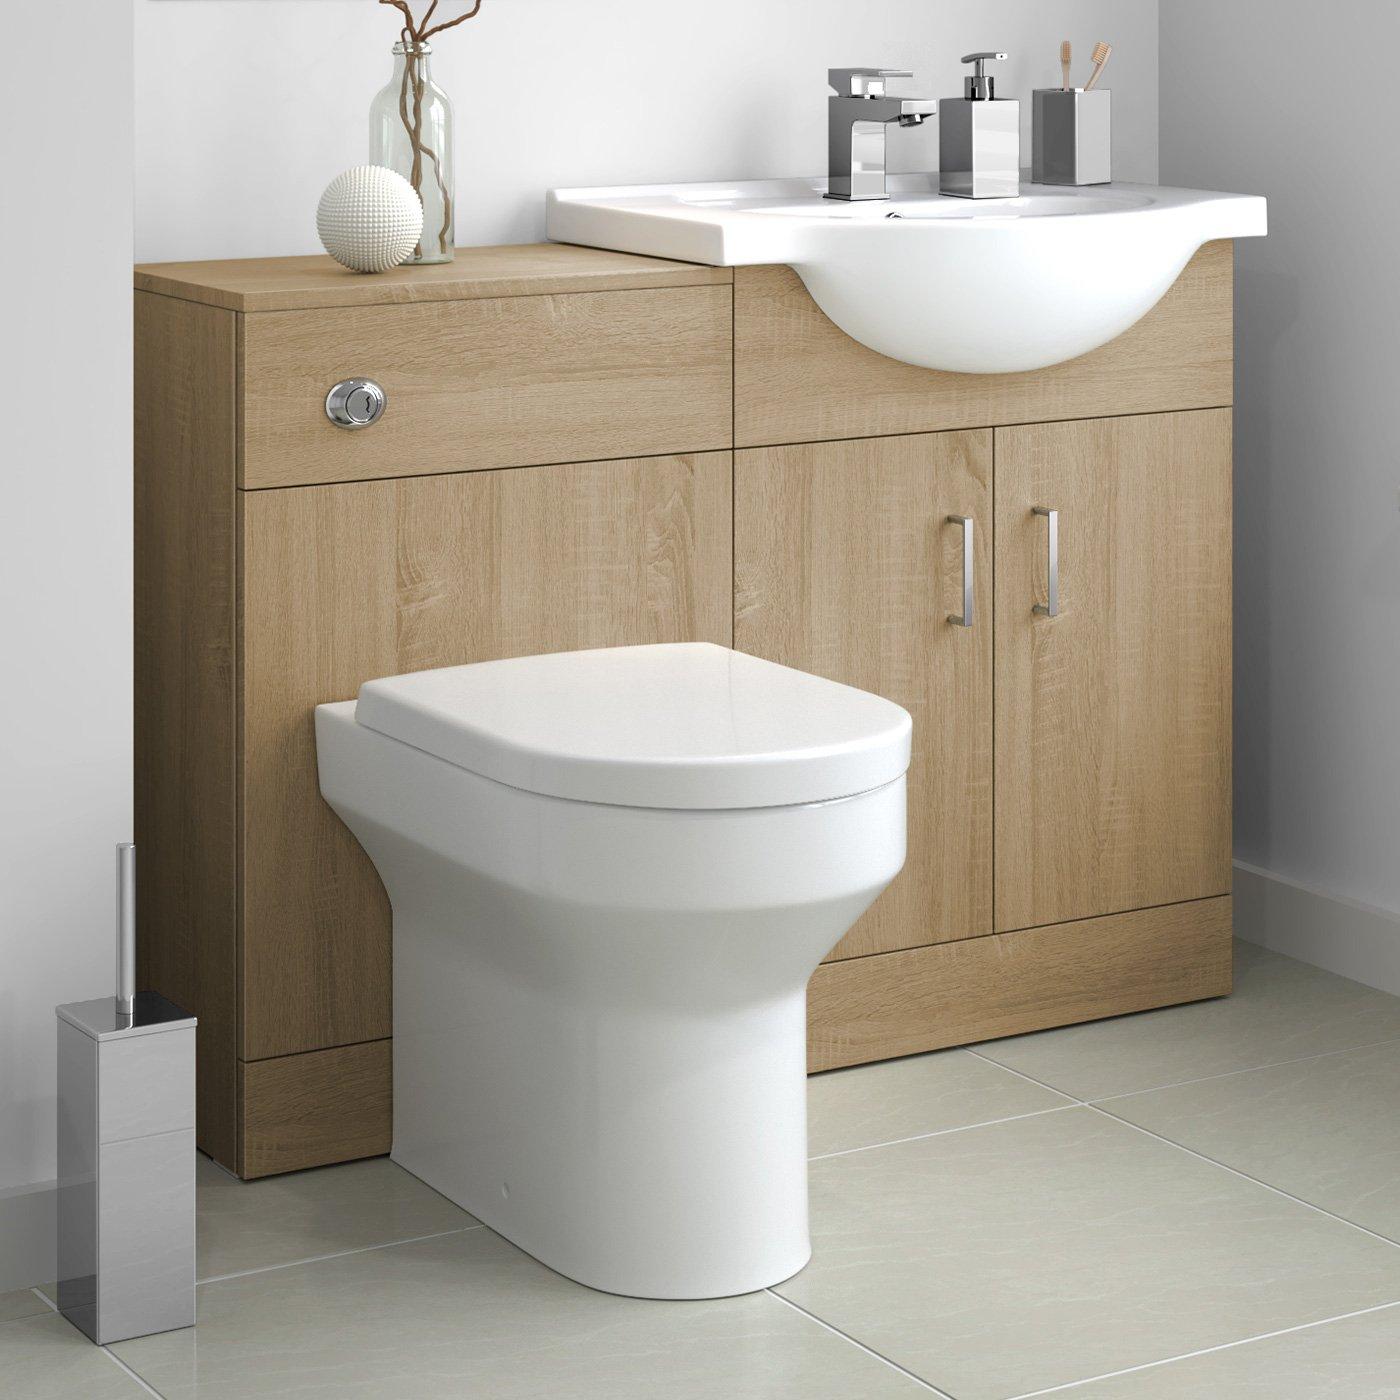 1000mm Gloss White Hudson Reed Cbi142 Fusion Modern Bathroom